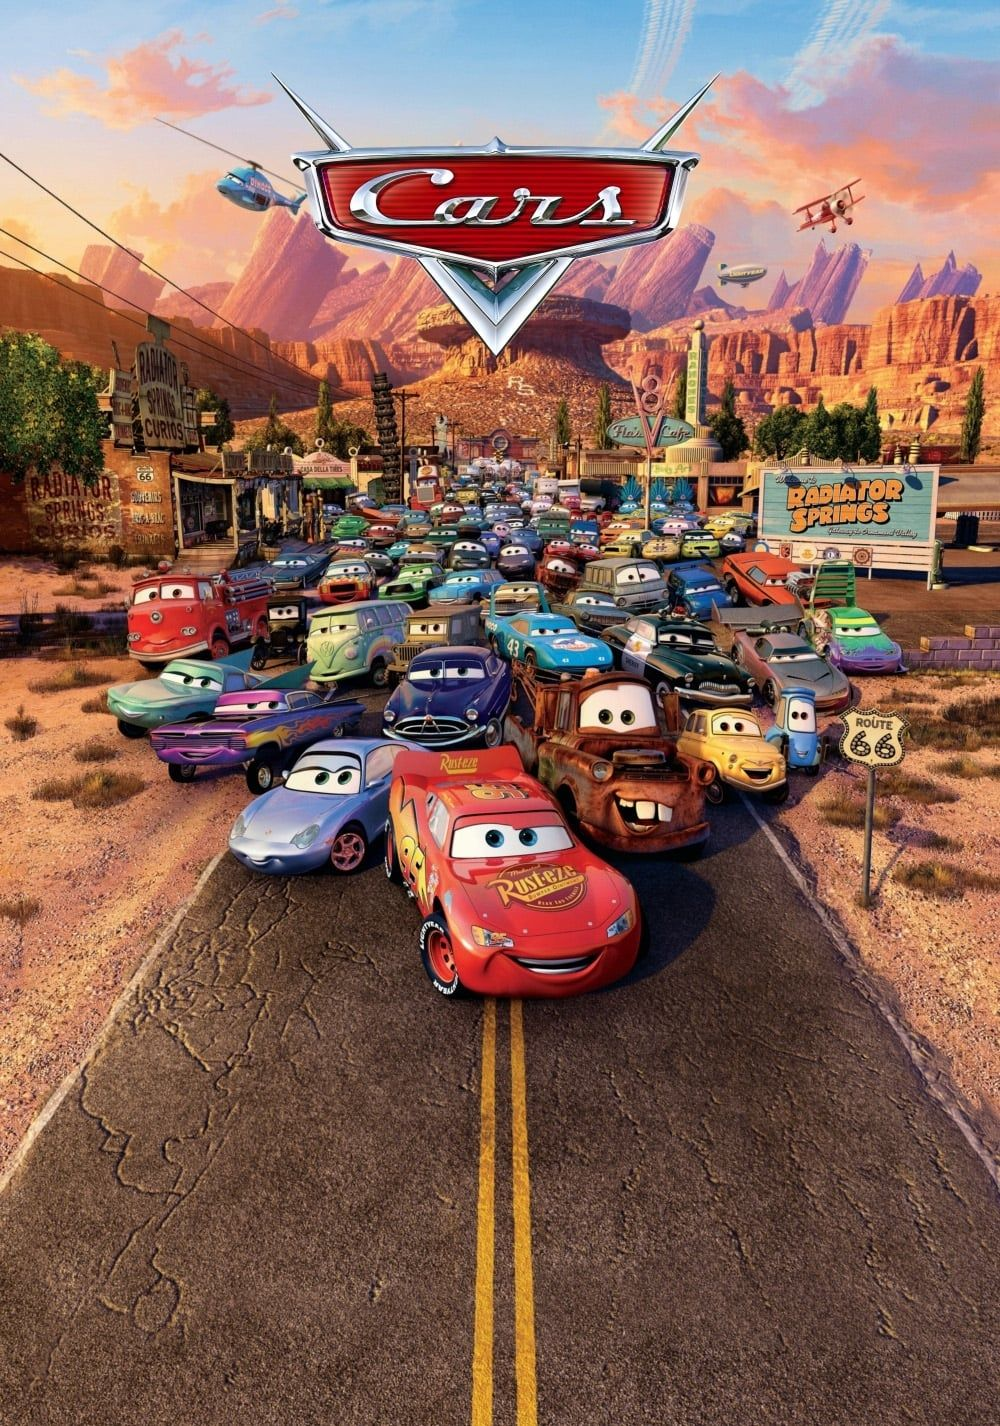 Full Watch Cars 2006 Full Online Movie Hd Free English Sub